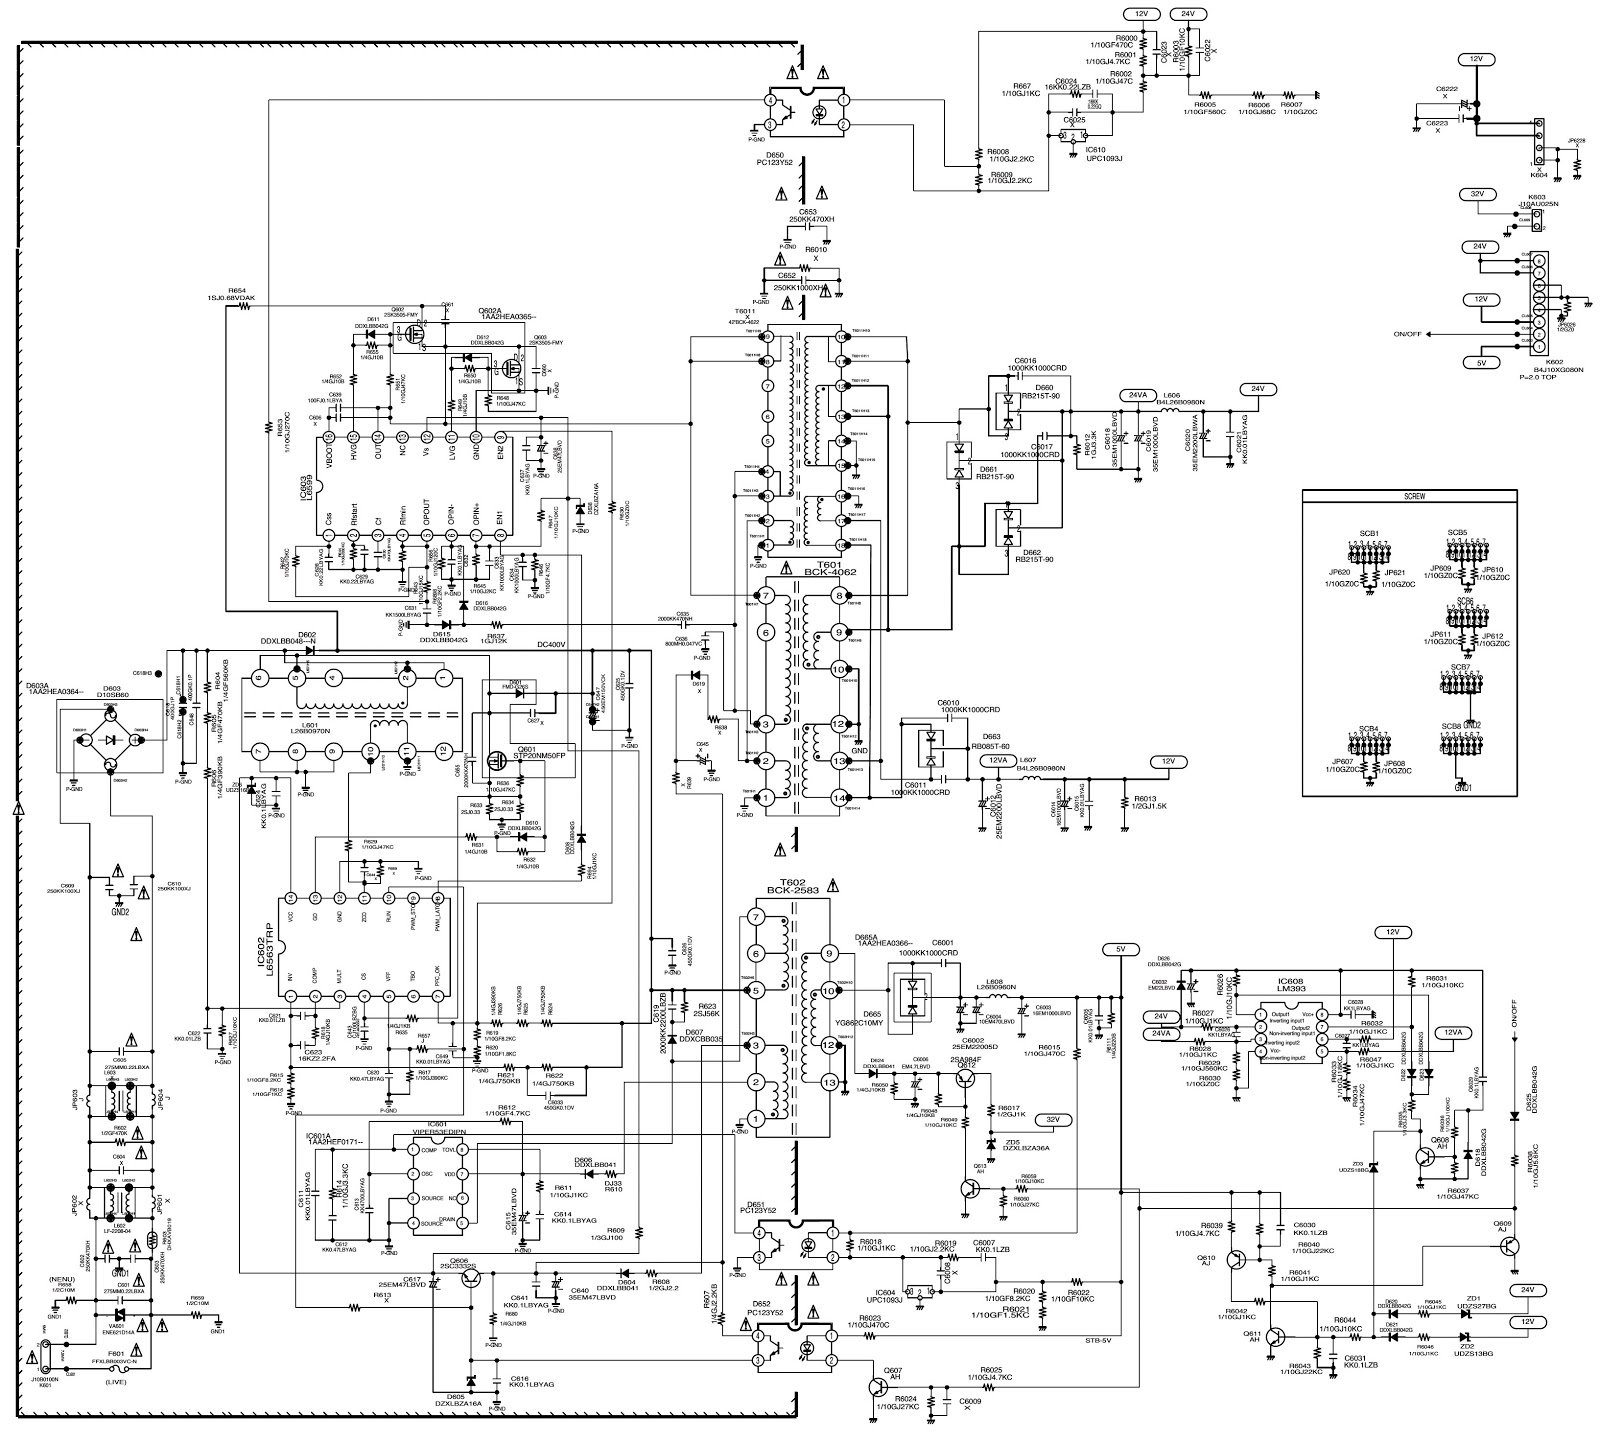 sanyo tv circuit diagram samsung tv audio wiring diagrams html imageresizertool com samsung tv circuit diagram #9